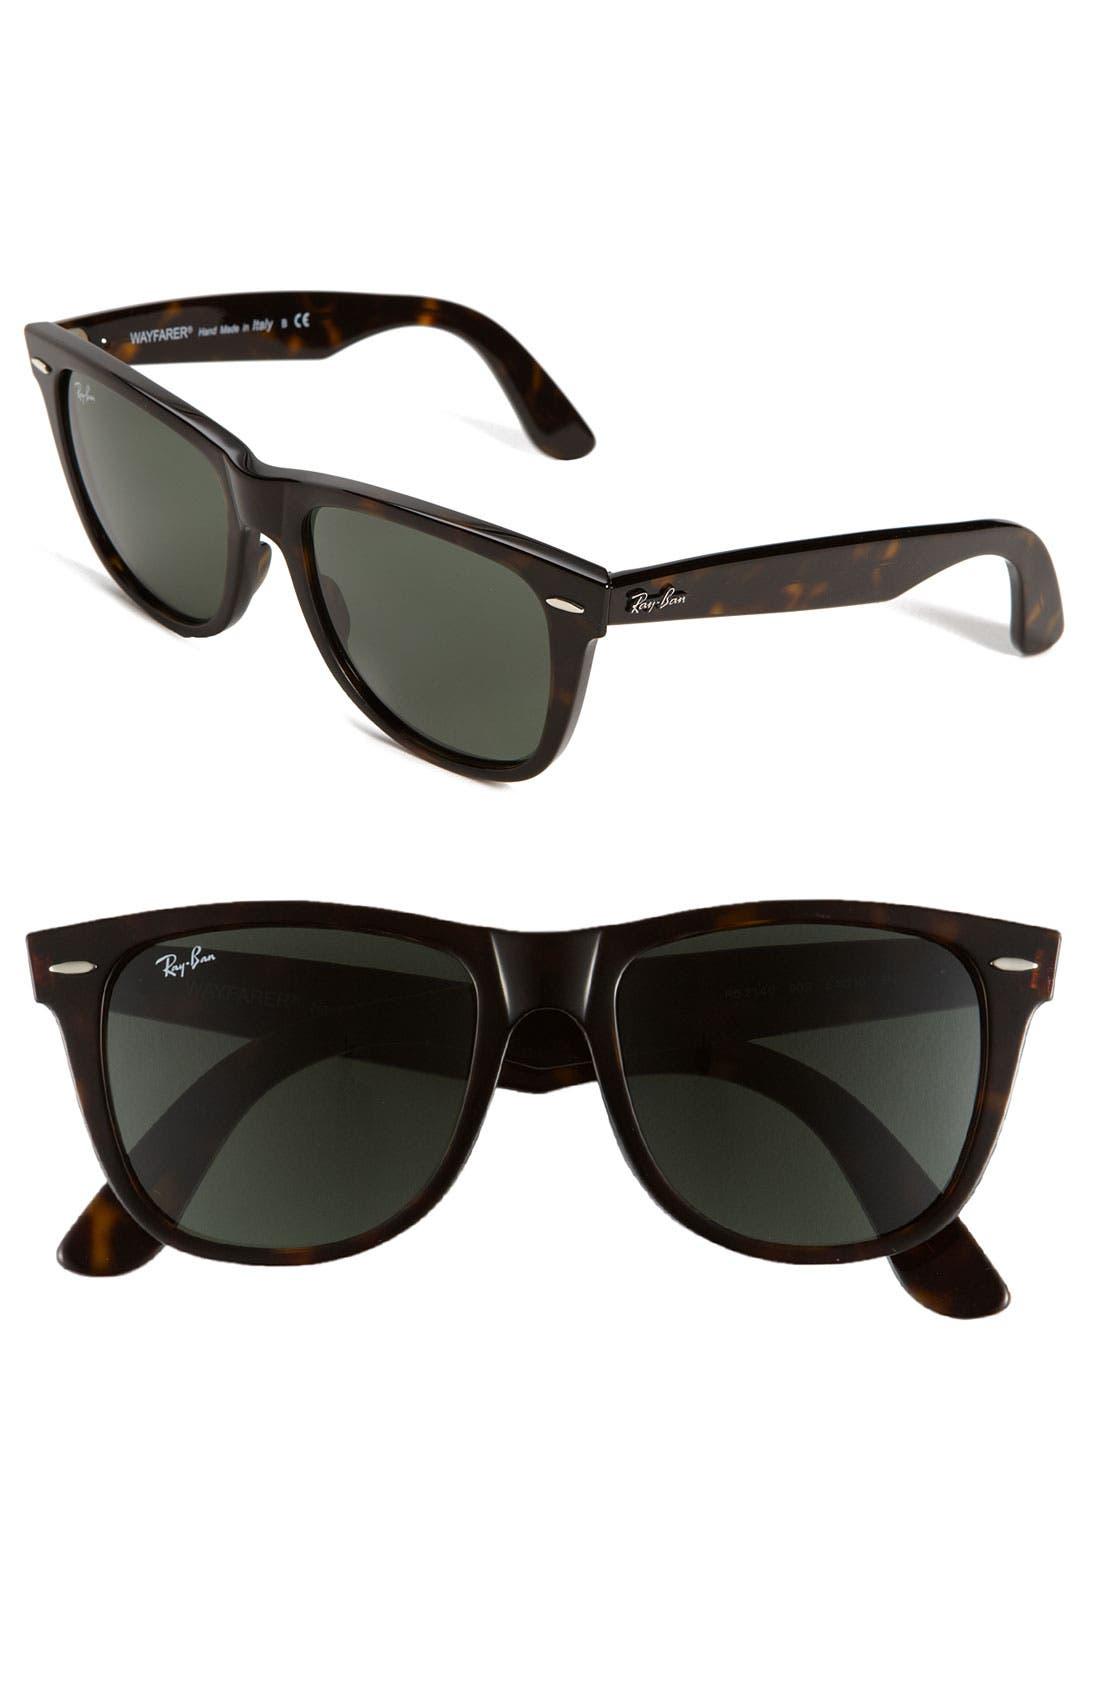 Main Image - Ray-Ban Classic Wayfarer 54mm Sunglasses